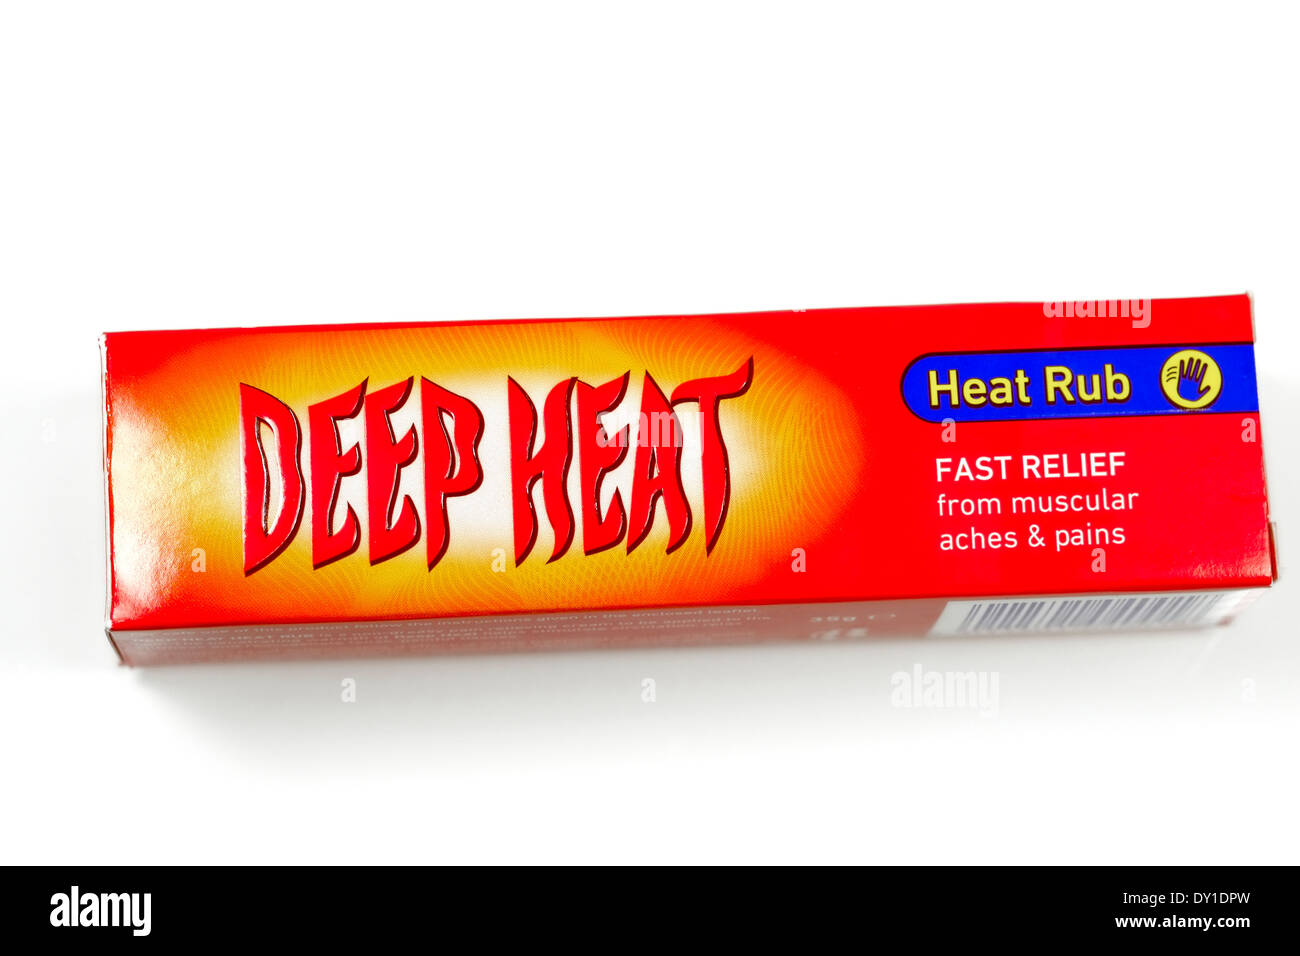 Retail pack of Deep Heat muscular heat rub - Stock Image